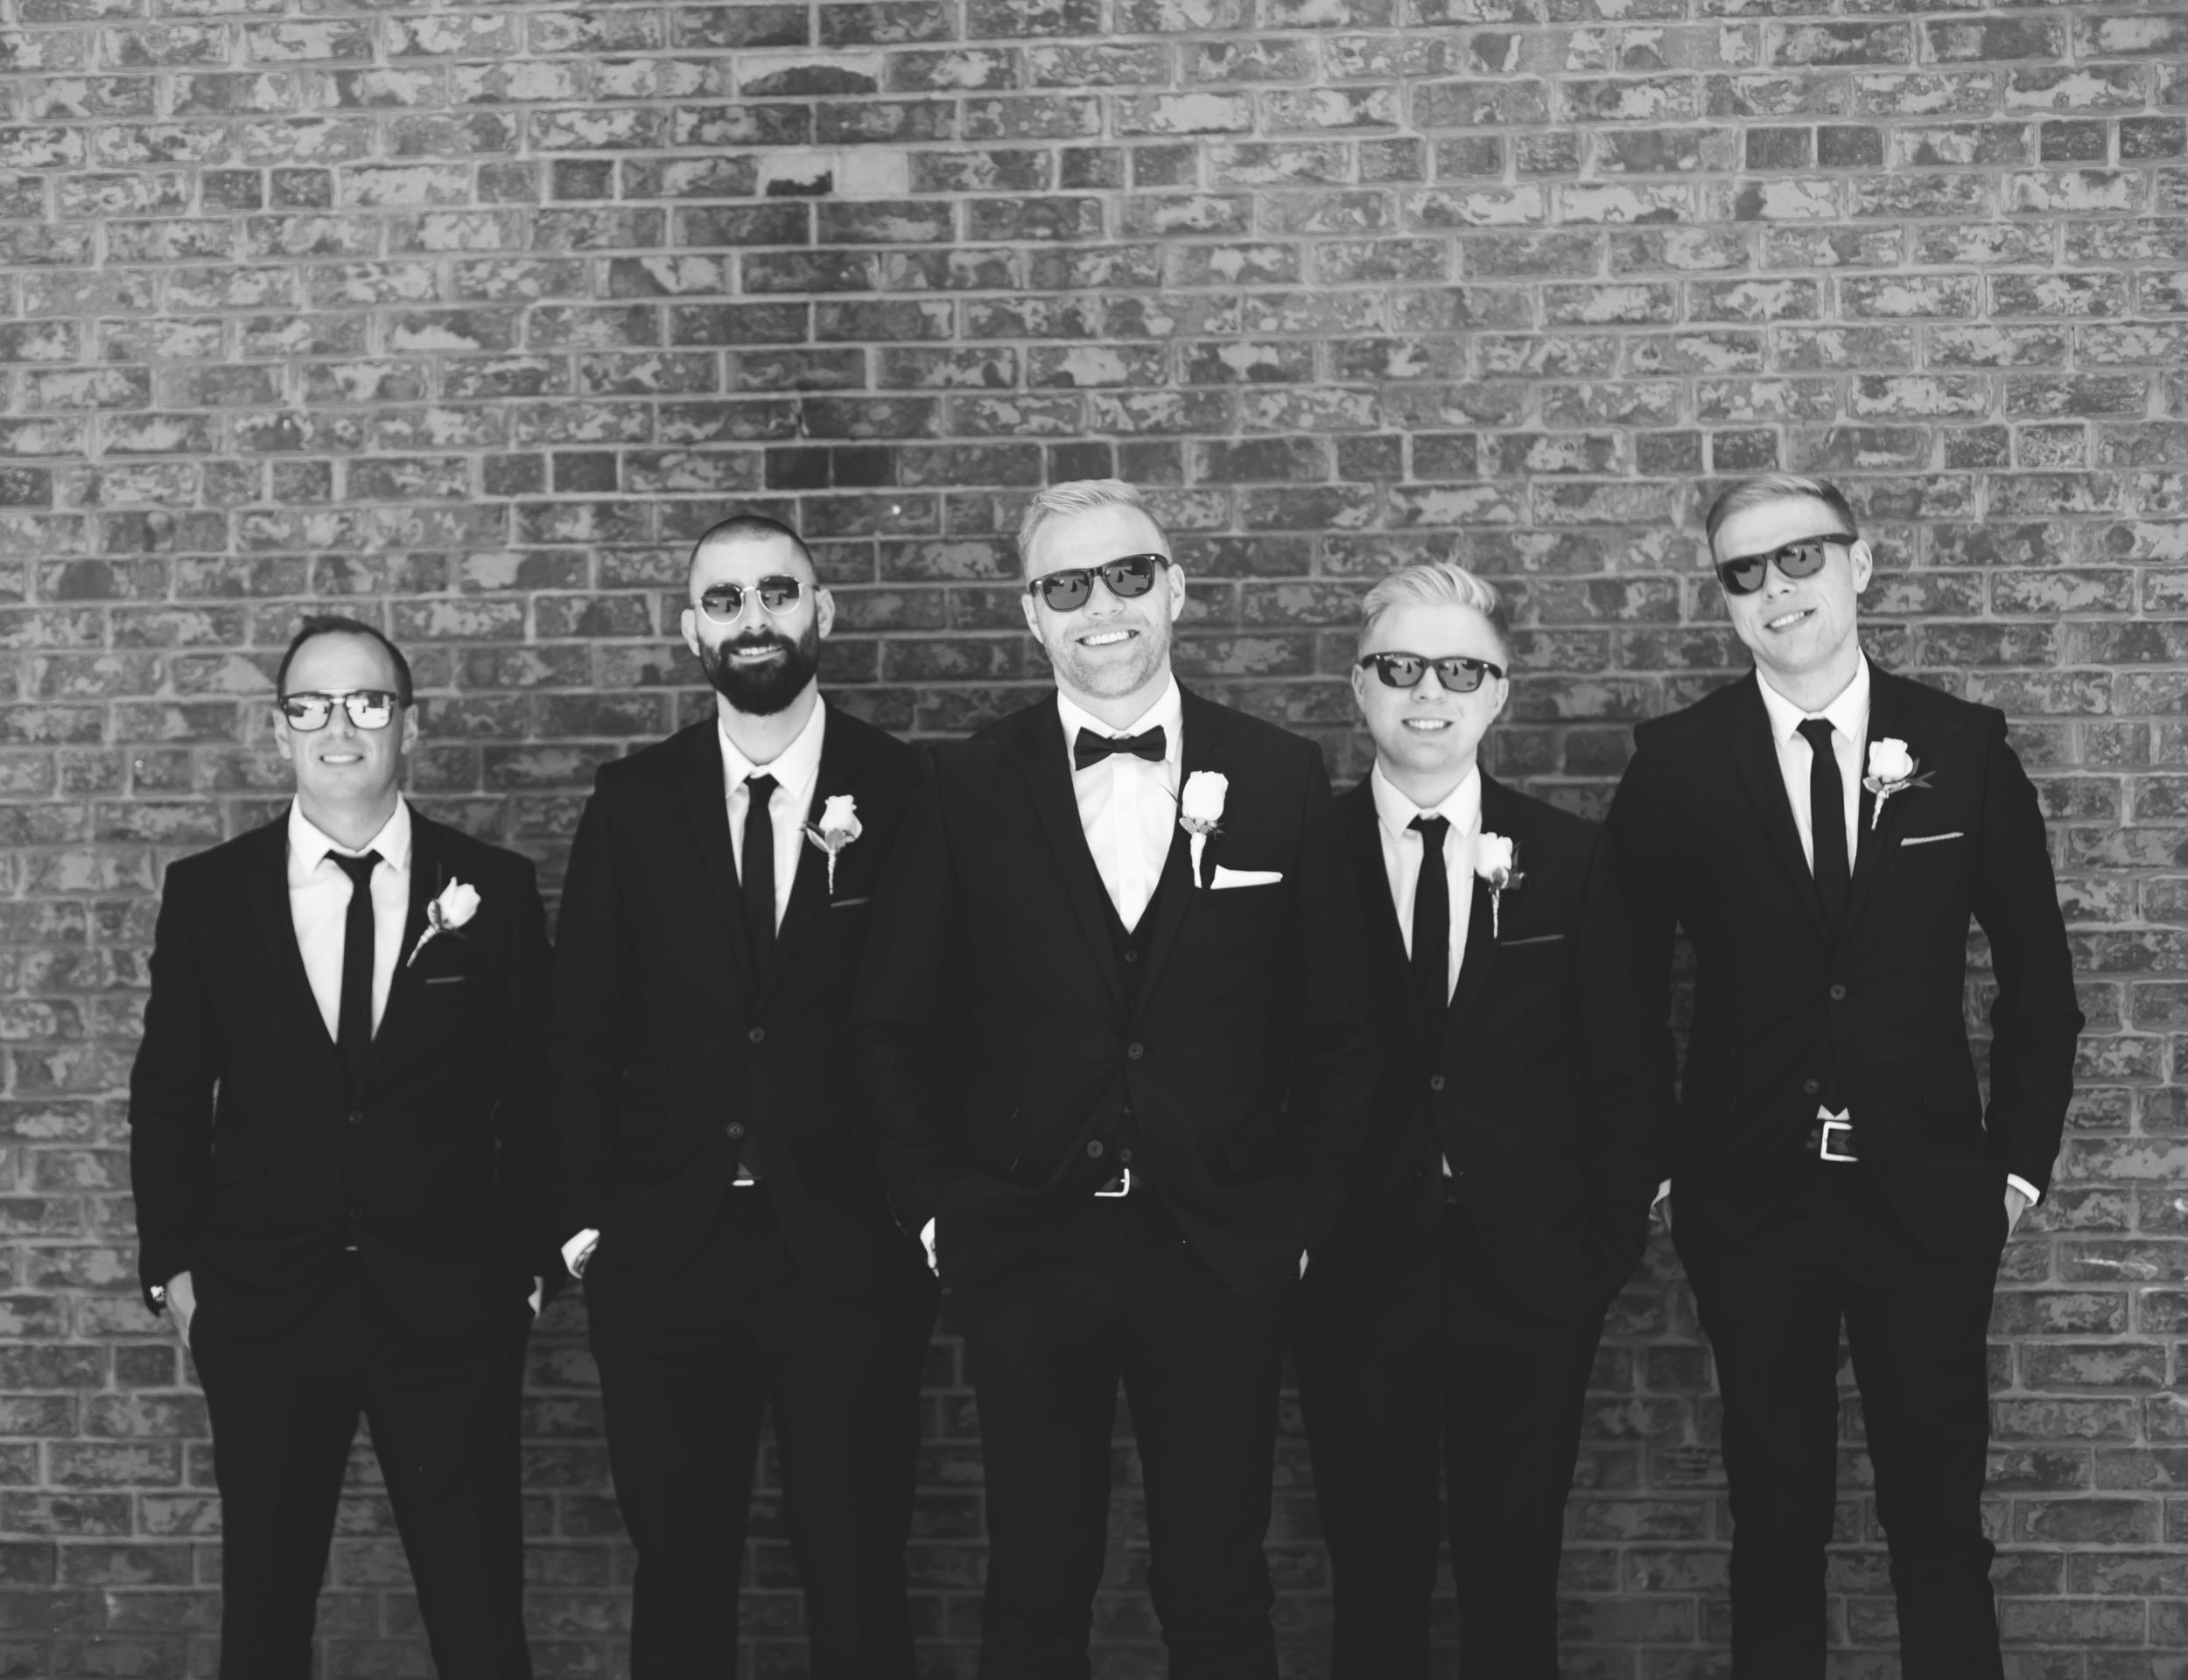 Wedding-Harbour-Banquet-Center-Oakville-Photographer-Wedding-Hamilton-Saint-James-Espresso-Downtown-HamOnt-GTA-Niagara-Toronto-Moments-by-Lauren-Photography-Photo-Image-36.png